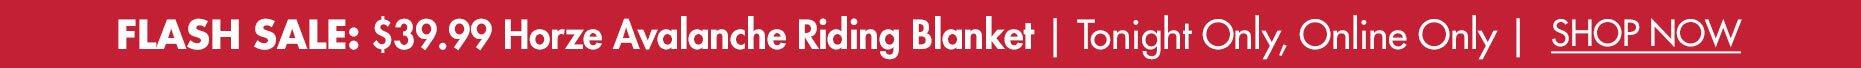 Flash Sale -  $39.99 Horze Avalanche Medium-Weight Riding Blanket